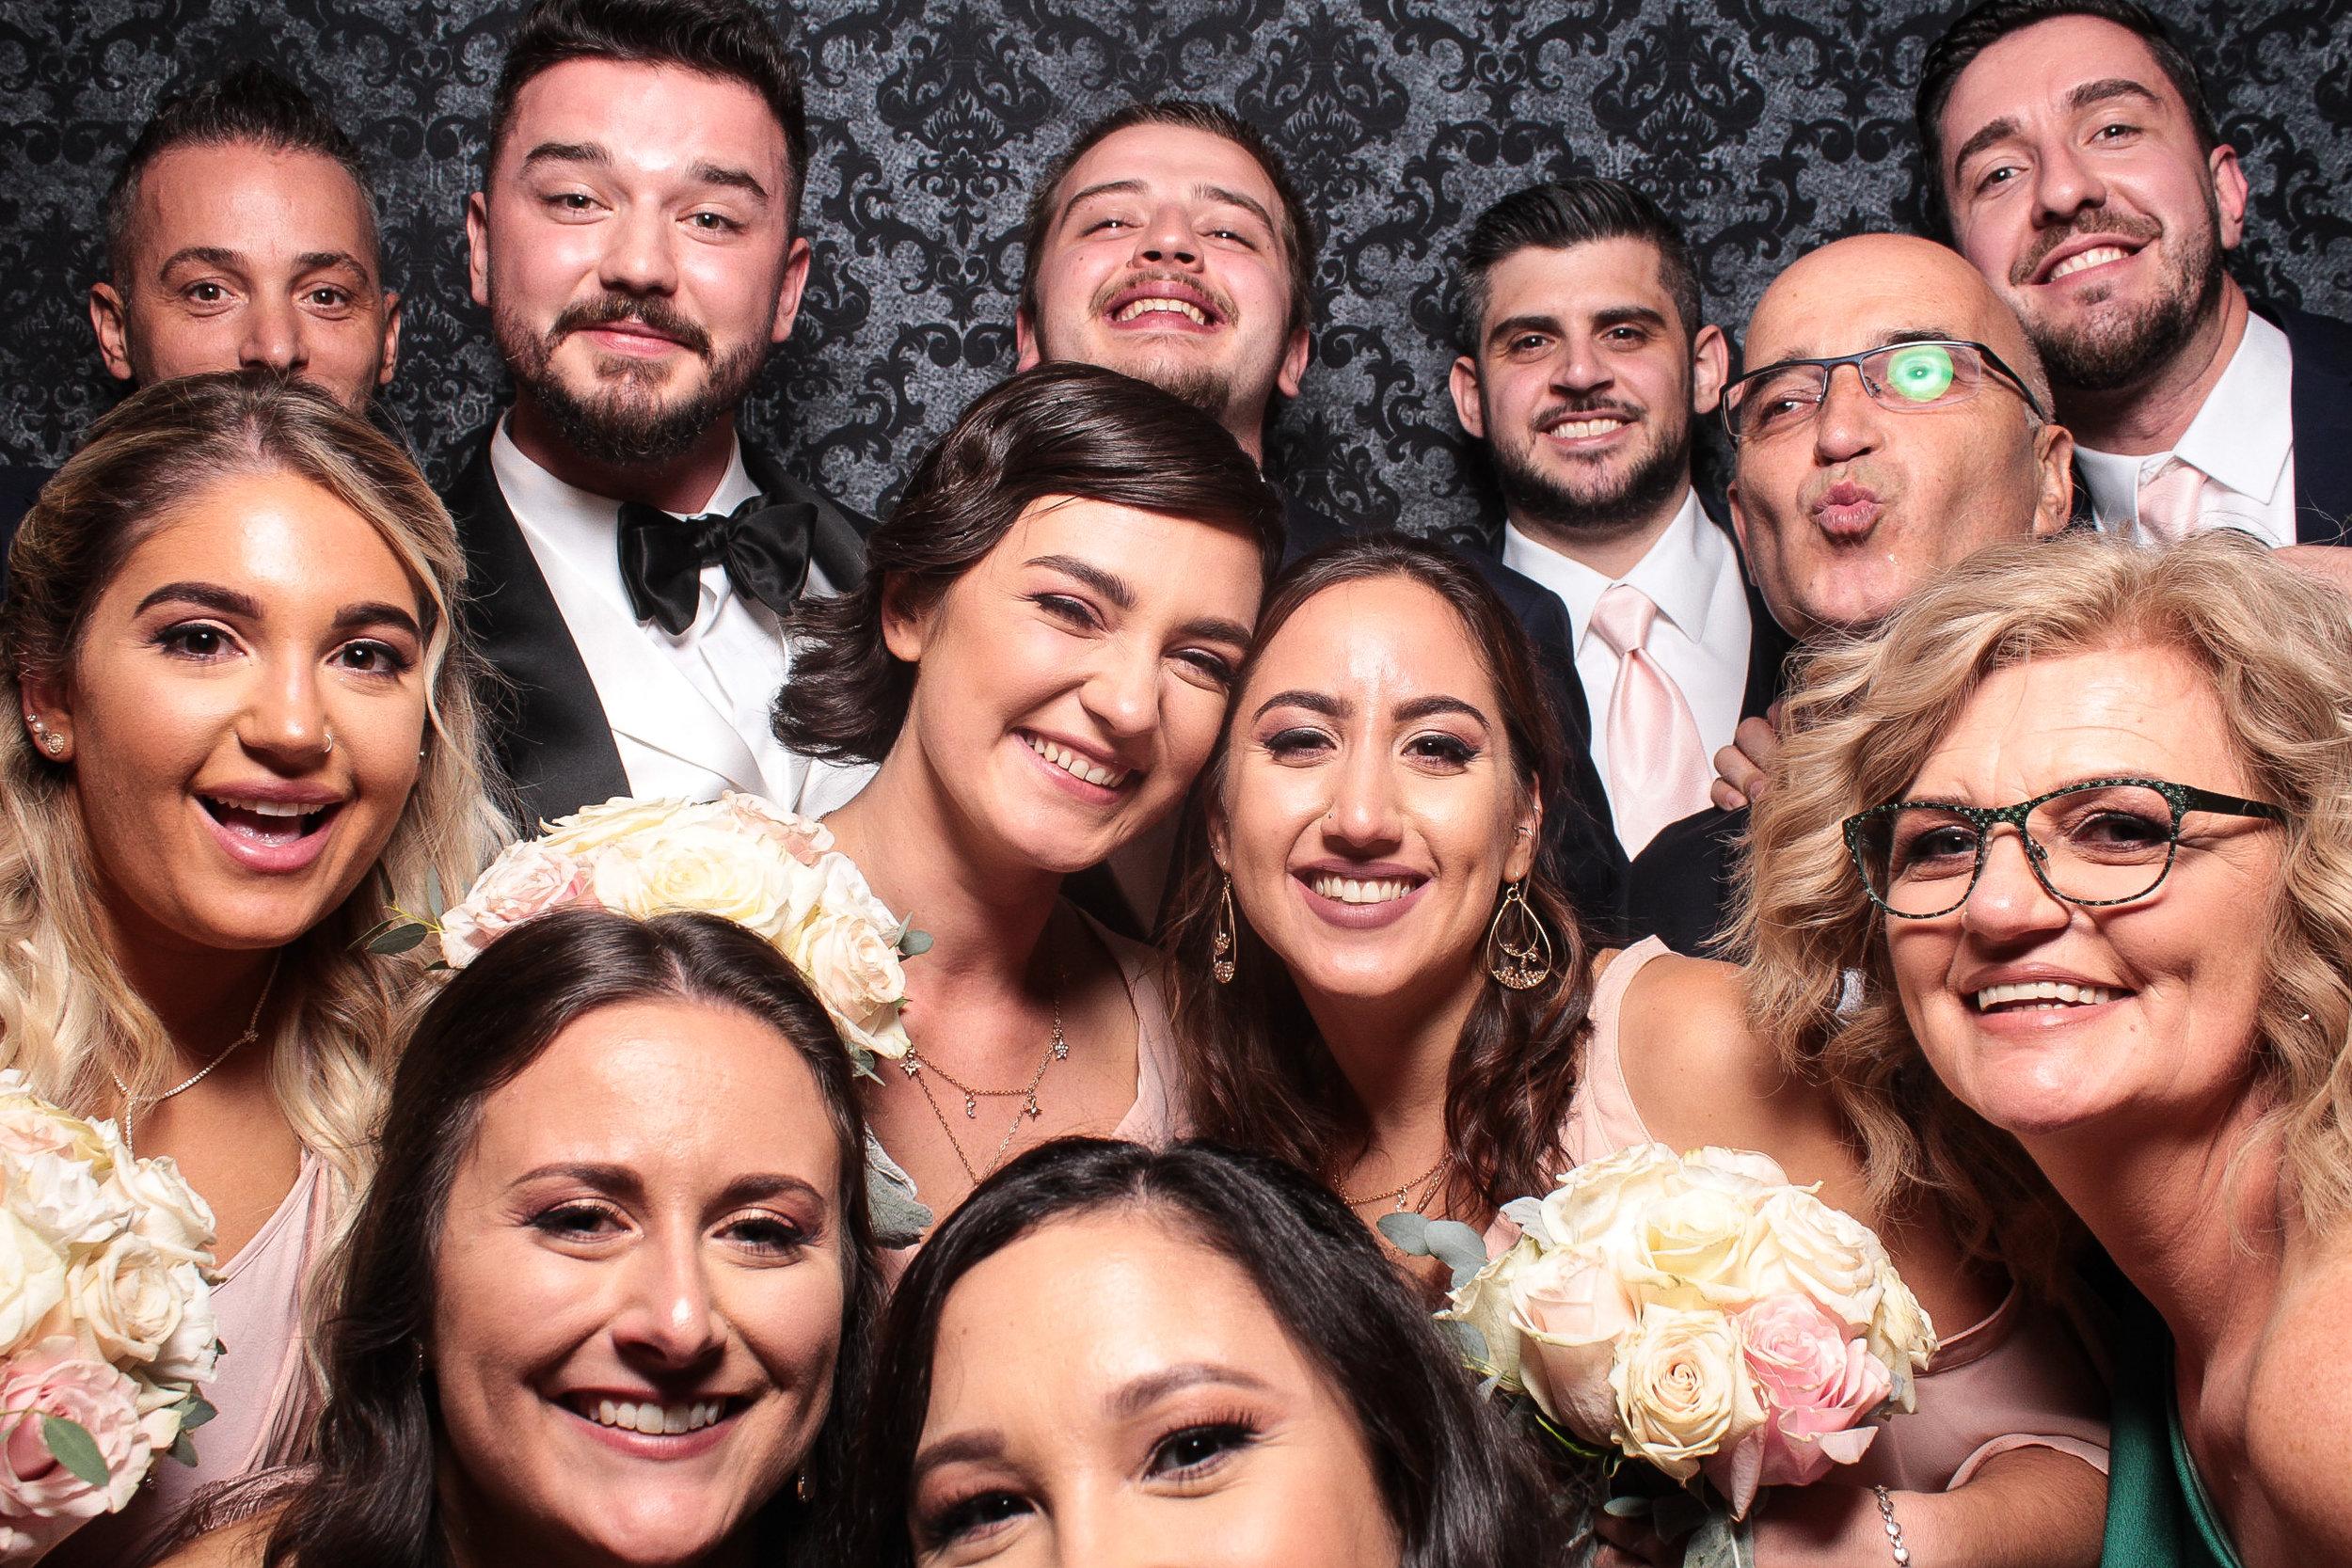 20191005_Cammarano-053.jpg